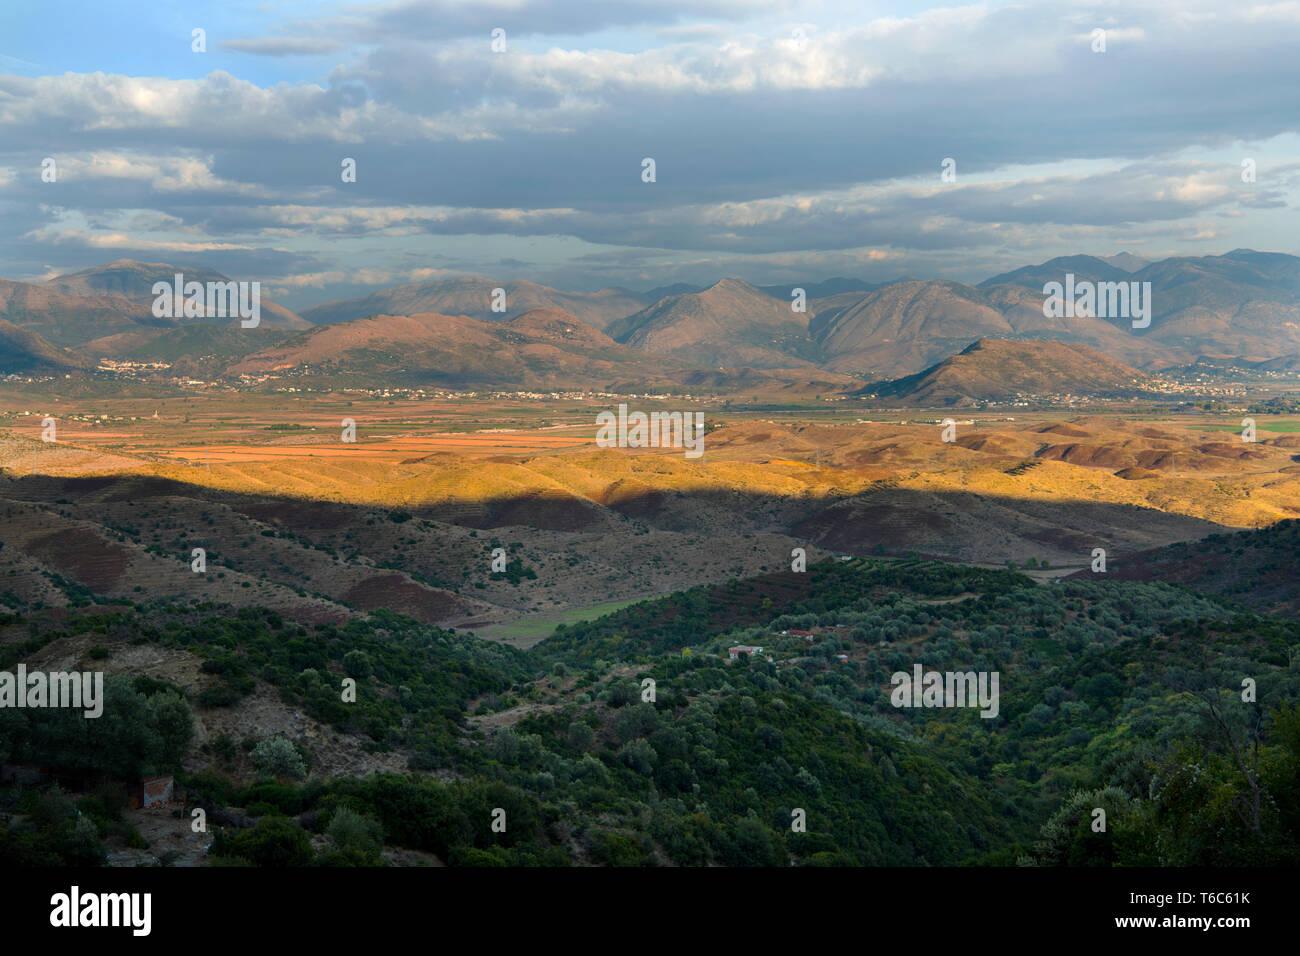 Albanien, Region_Vlora, Landschaft bei Nivice - Stock Image